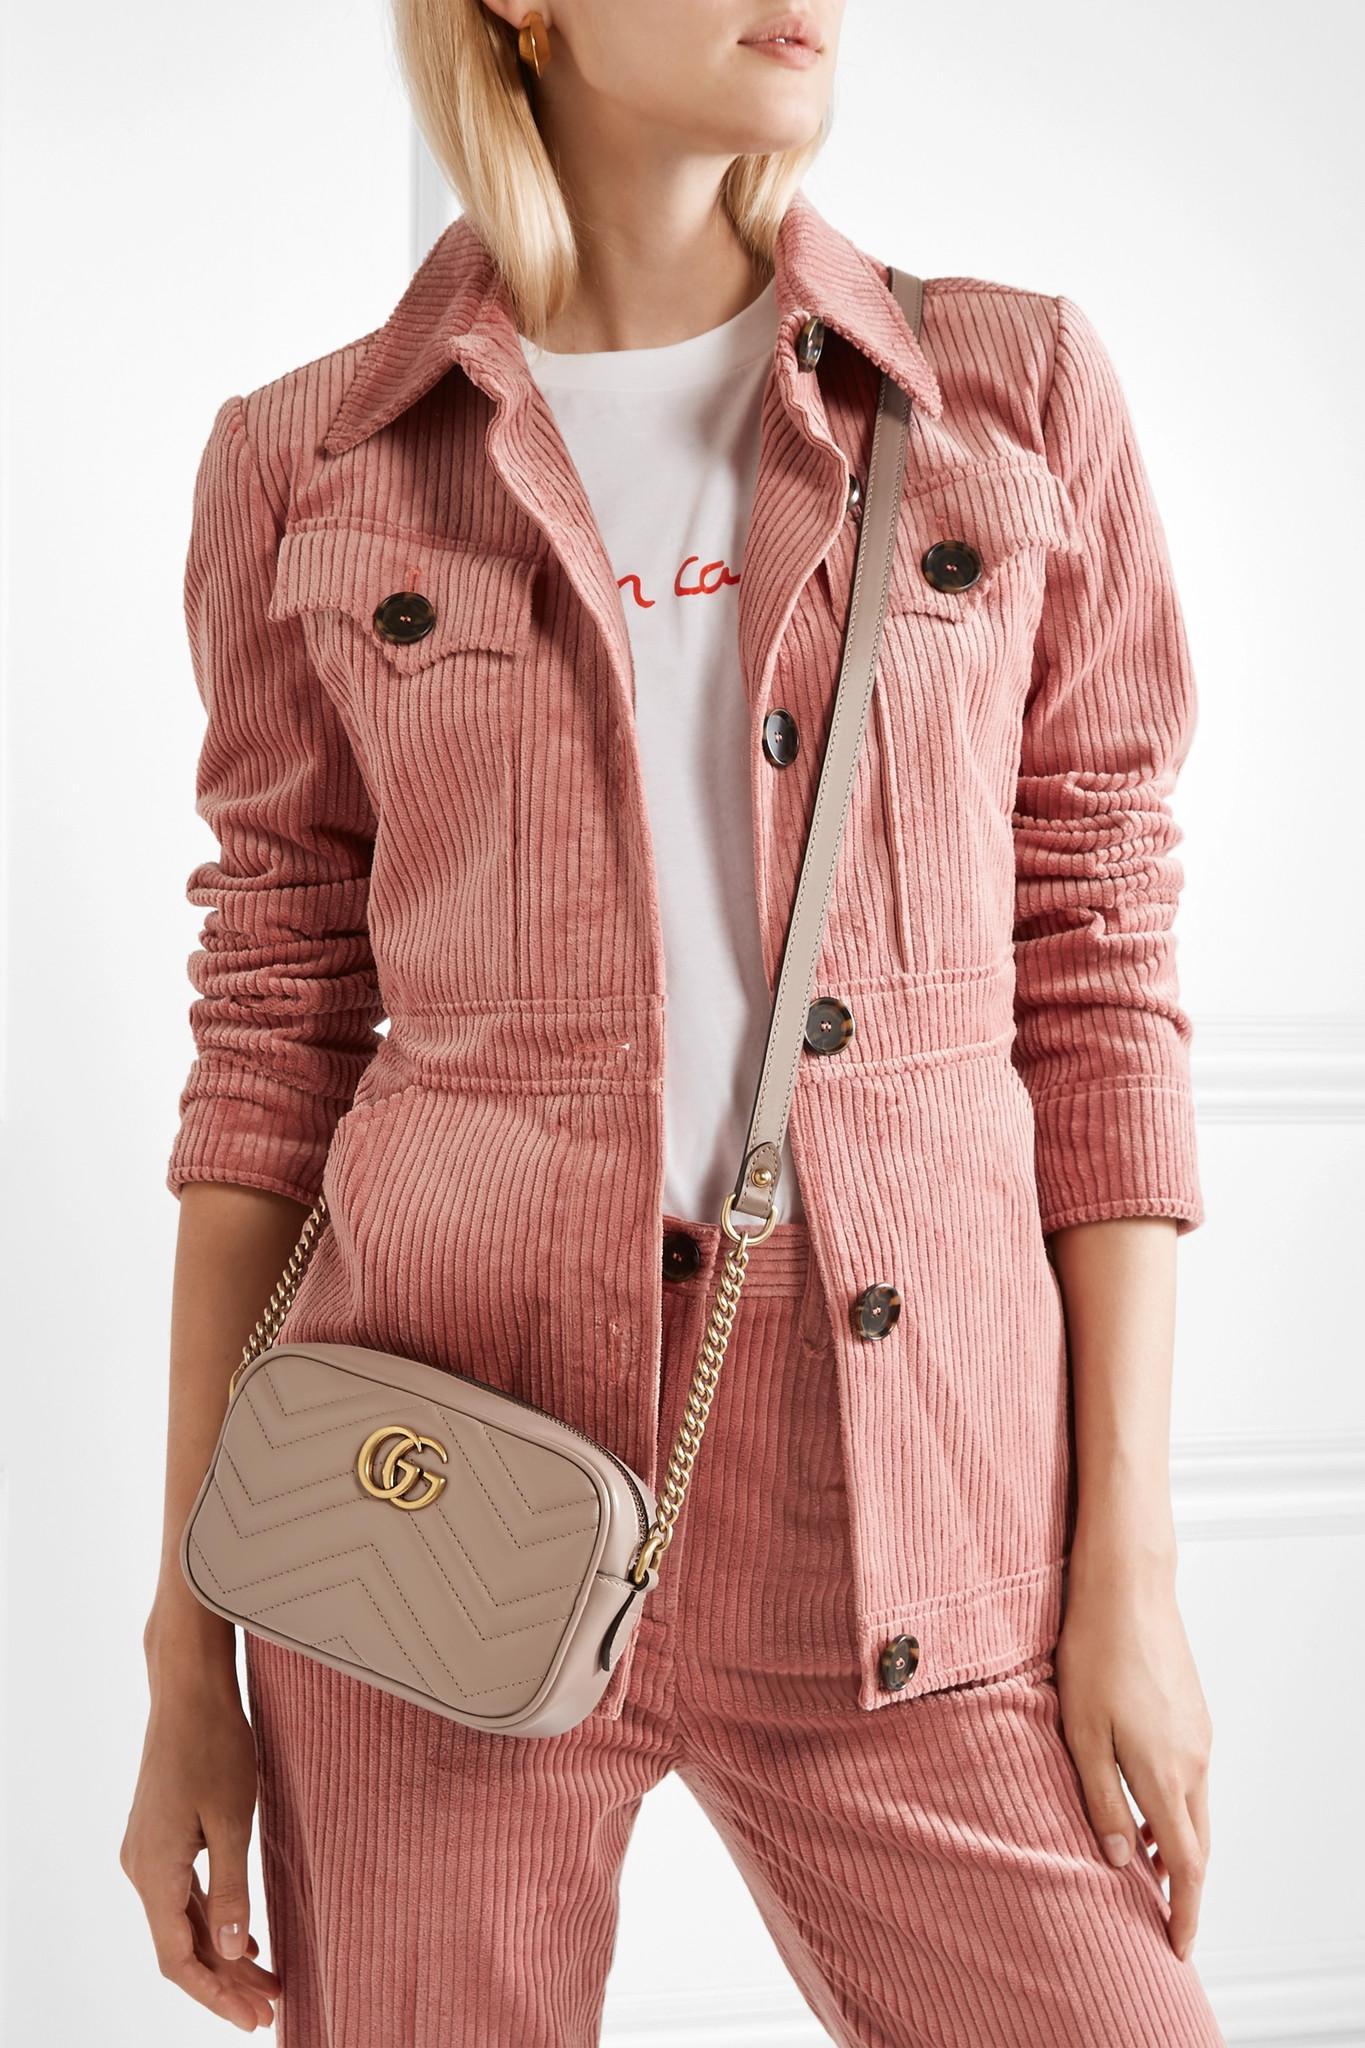 8c210af277da Gucci Gg Marmont Camera Mini Quilted Leather Shoulder Bag - Lyst